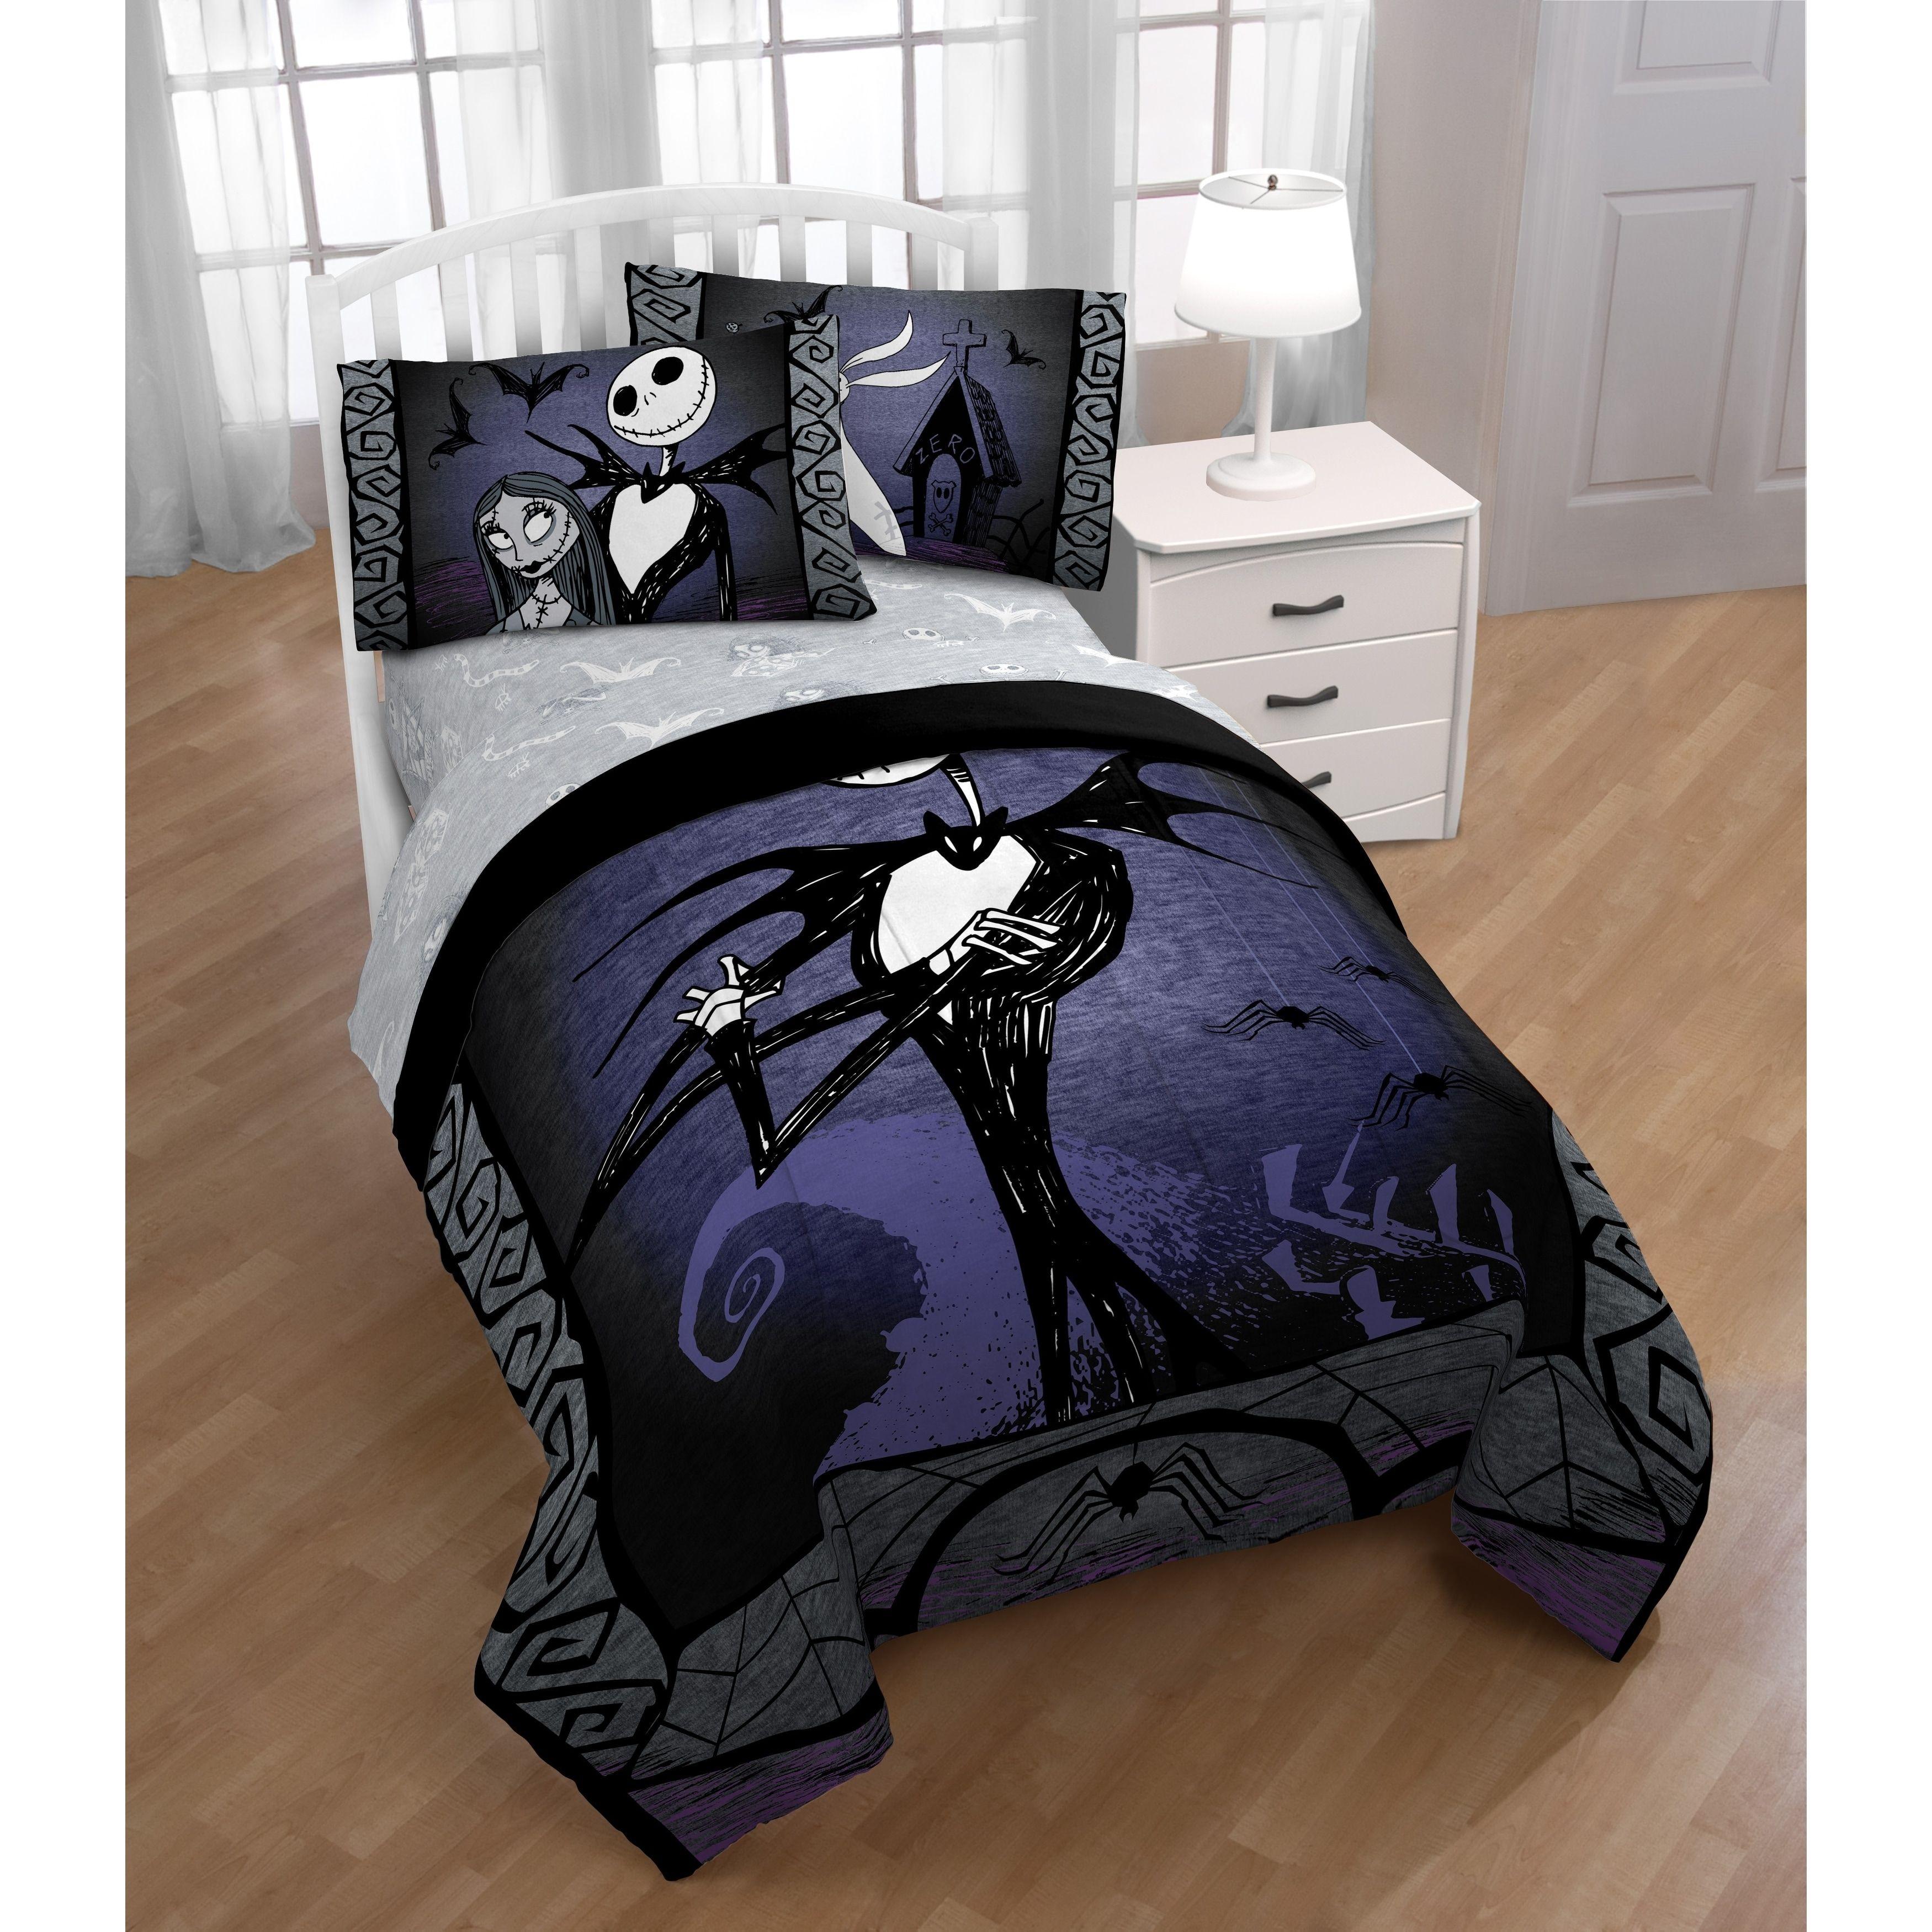 Disney Nightmare Before Christmas Meant To Be Reversible Comforter Nightmare Before Christmas Bedding Nightmare Before Christmas Christmas Decorations Bedroom